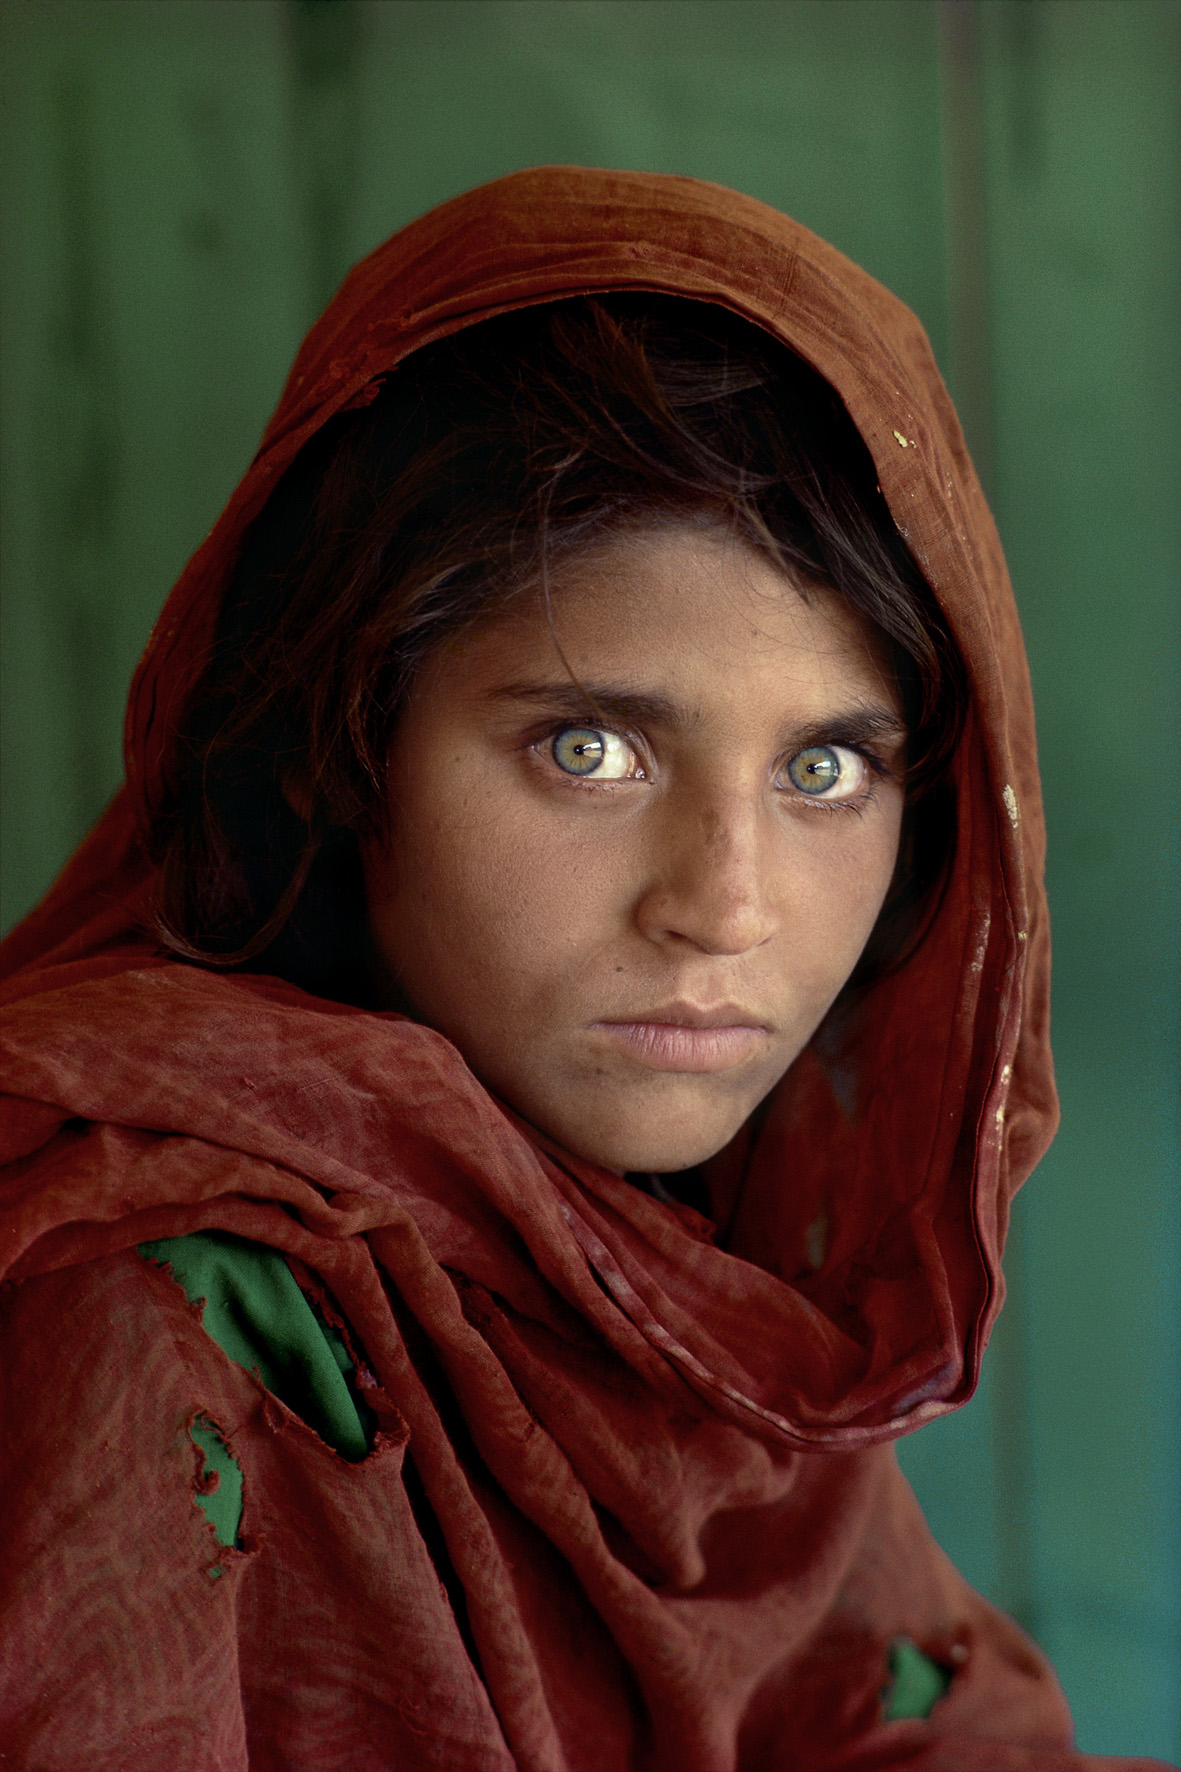 Sharbat Gula, Afghan Girl, at Nasir Bagh refugee camp near Peshawar, Pakistan, 1984. National Geographic.